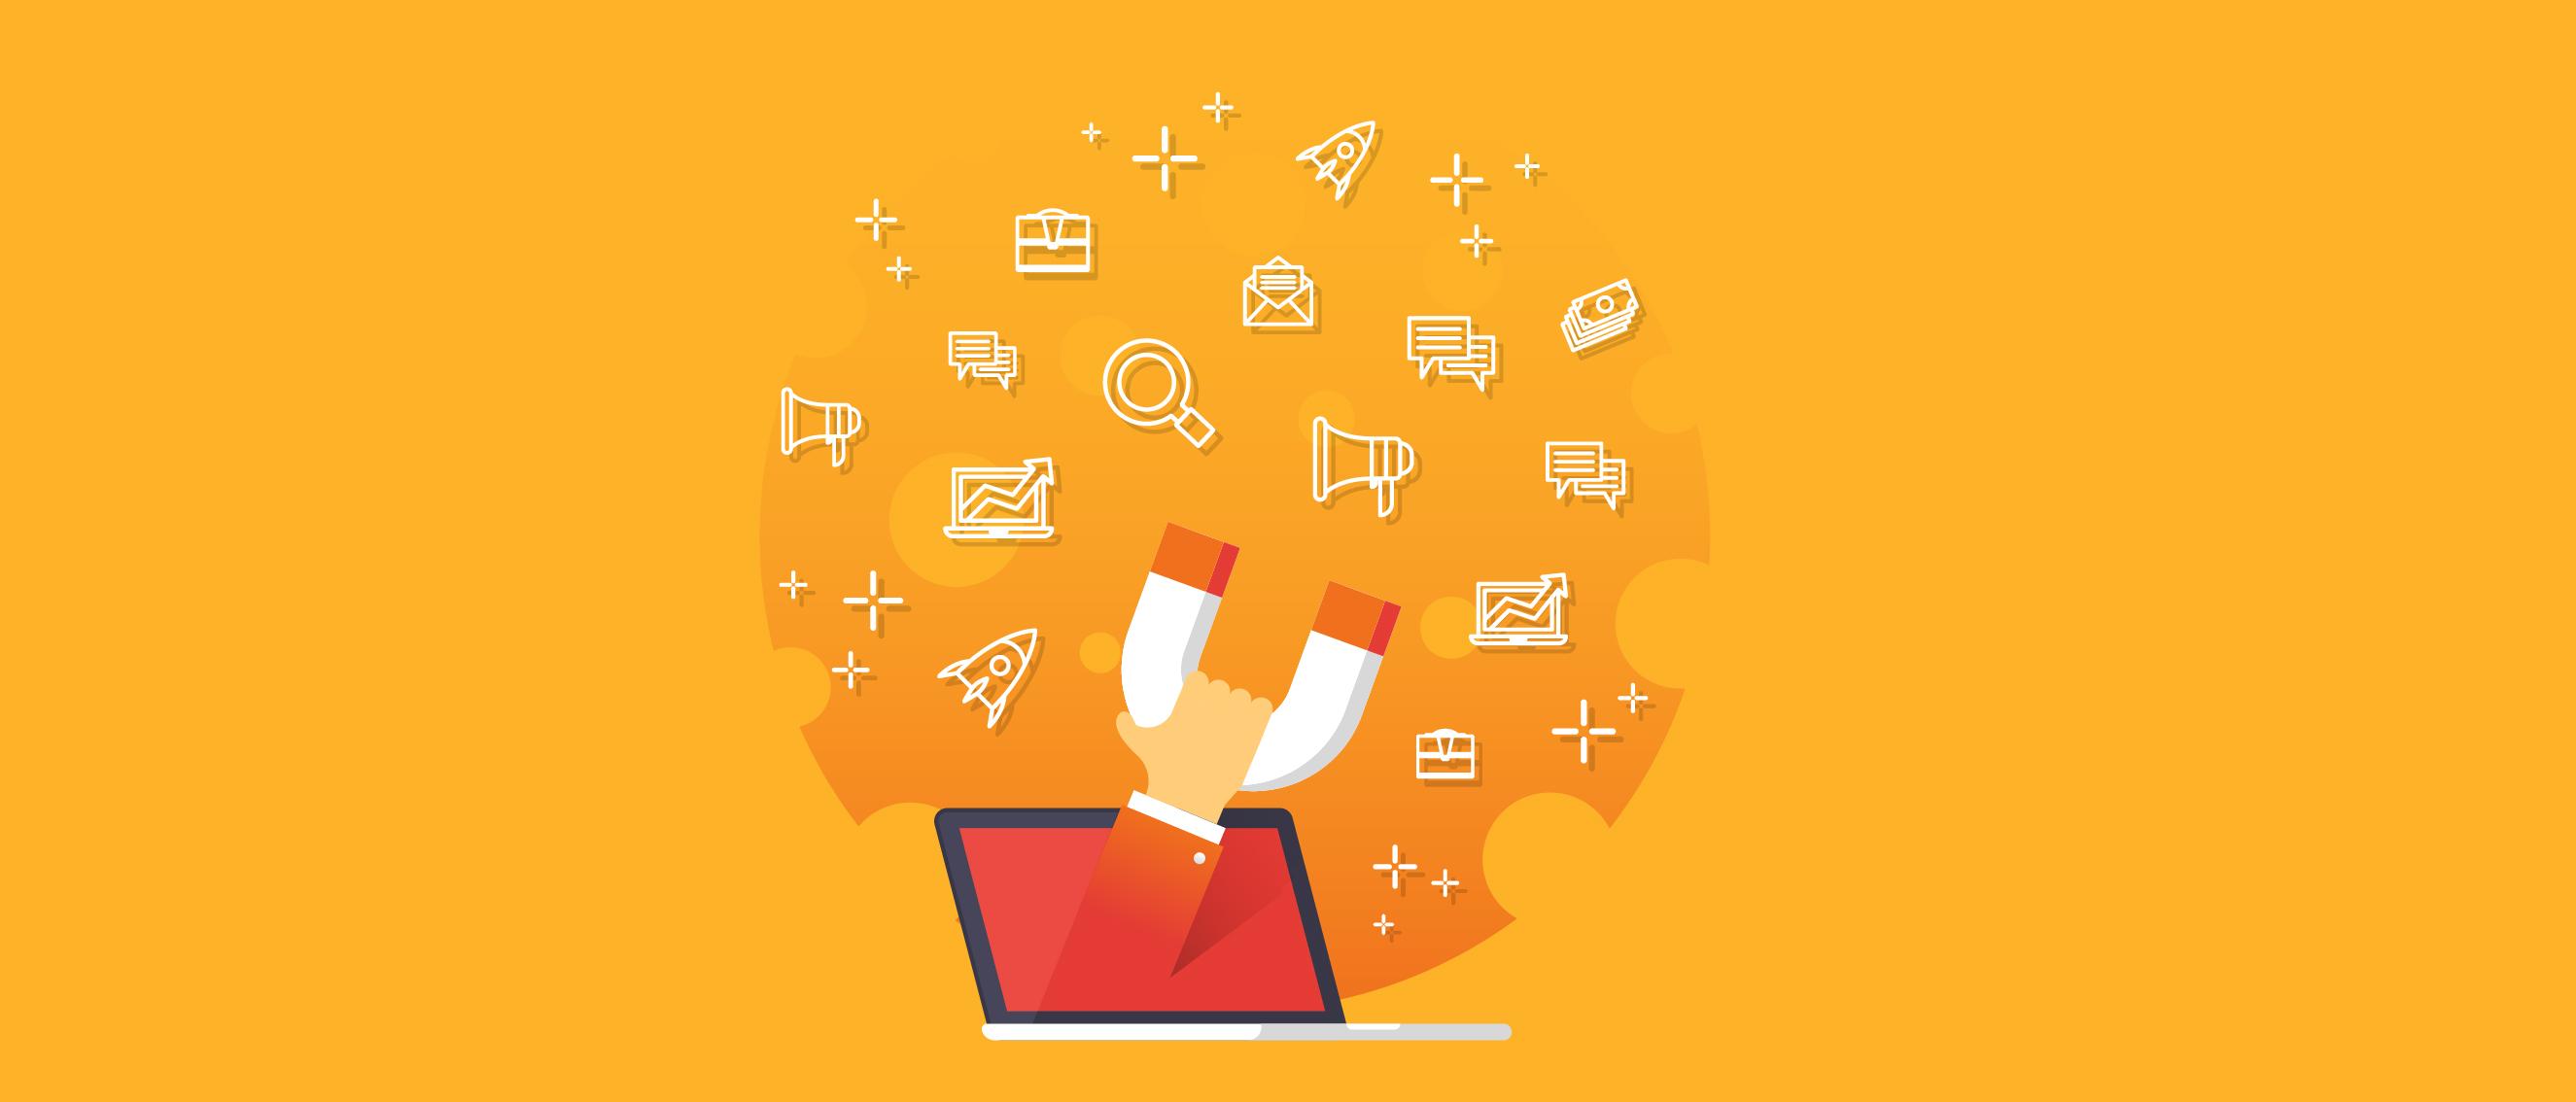 Learn about digital marketing